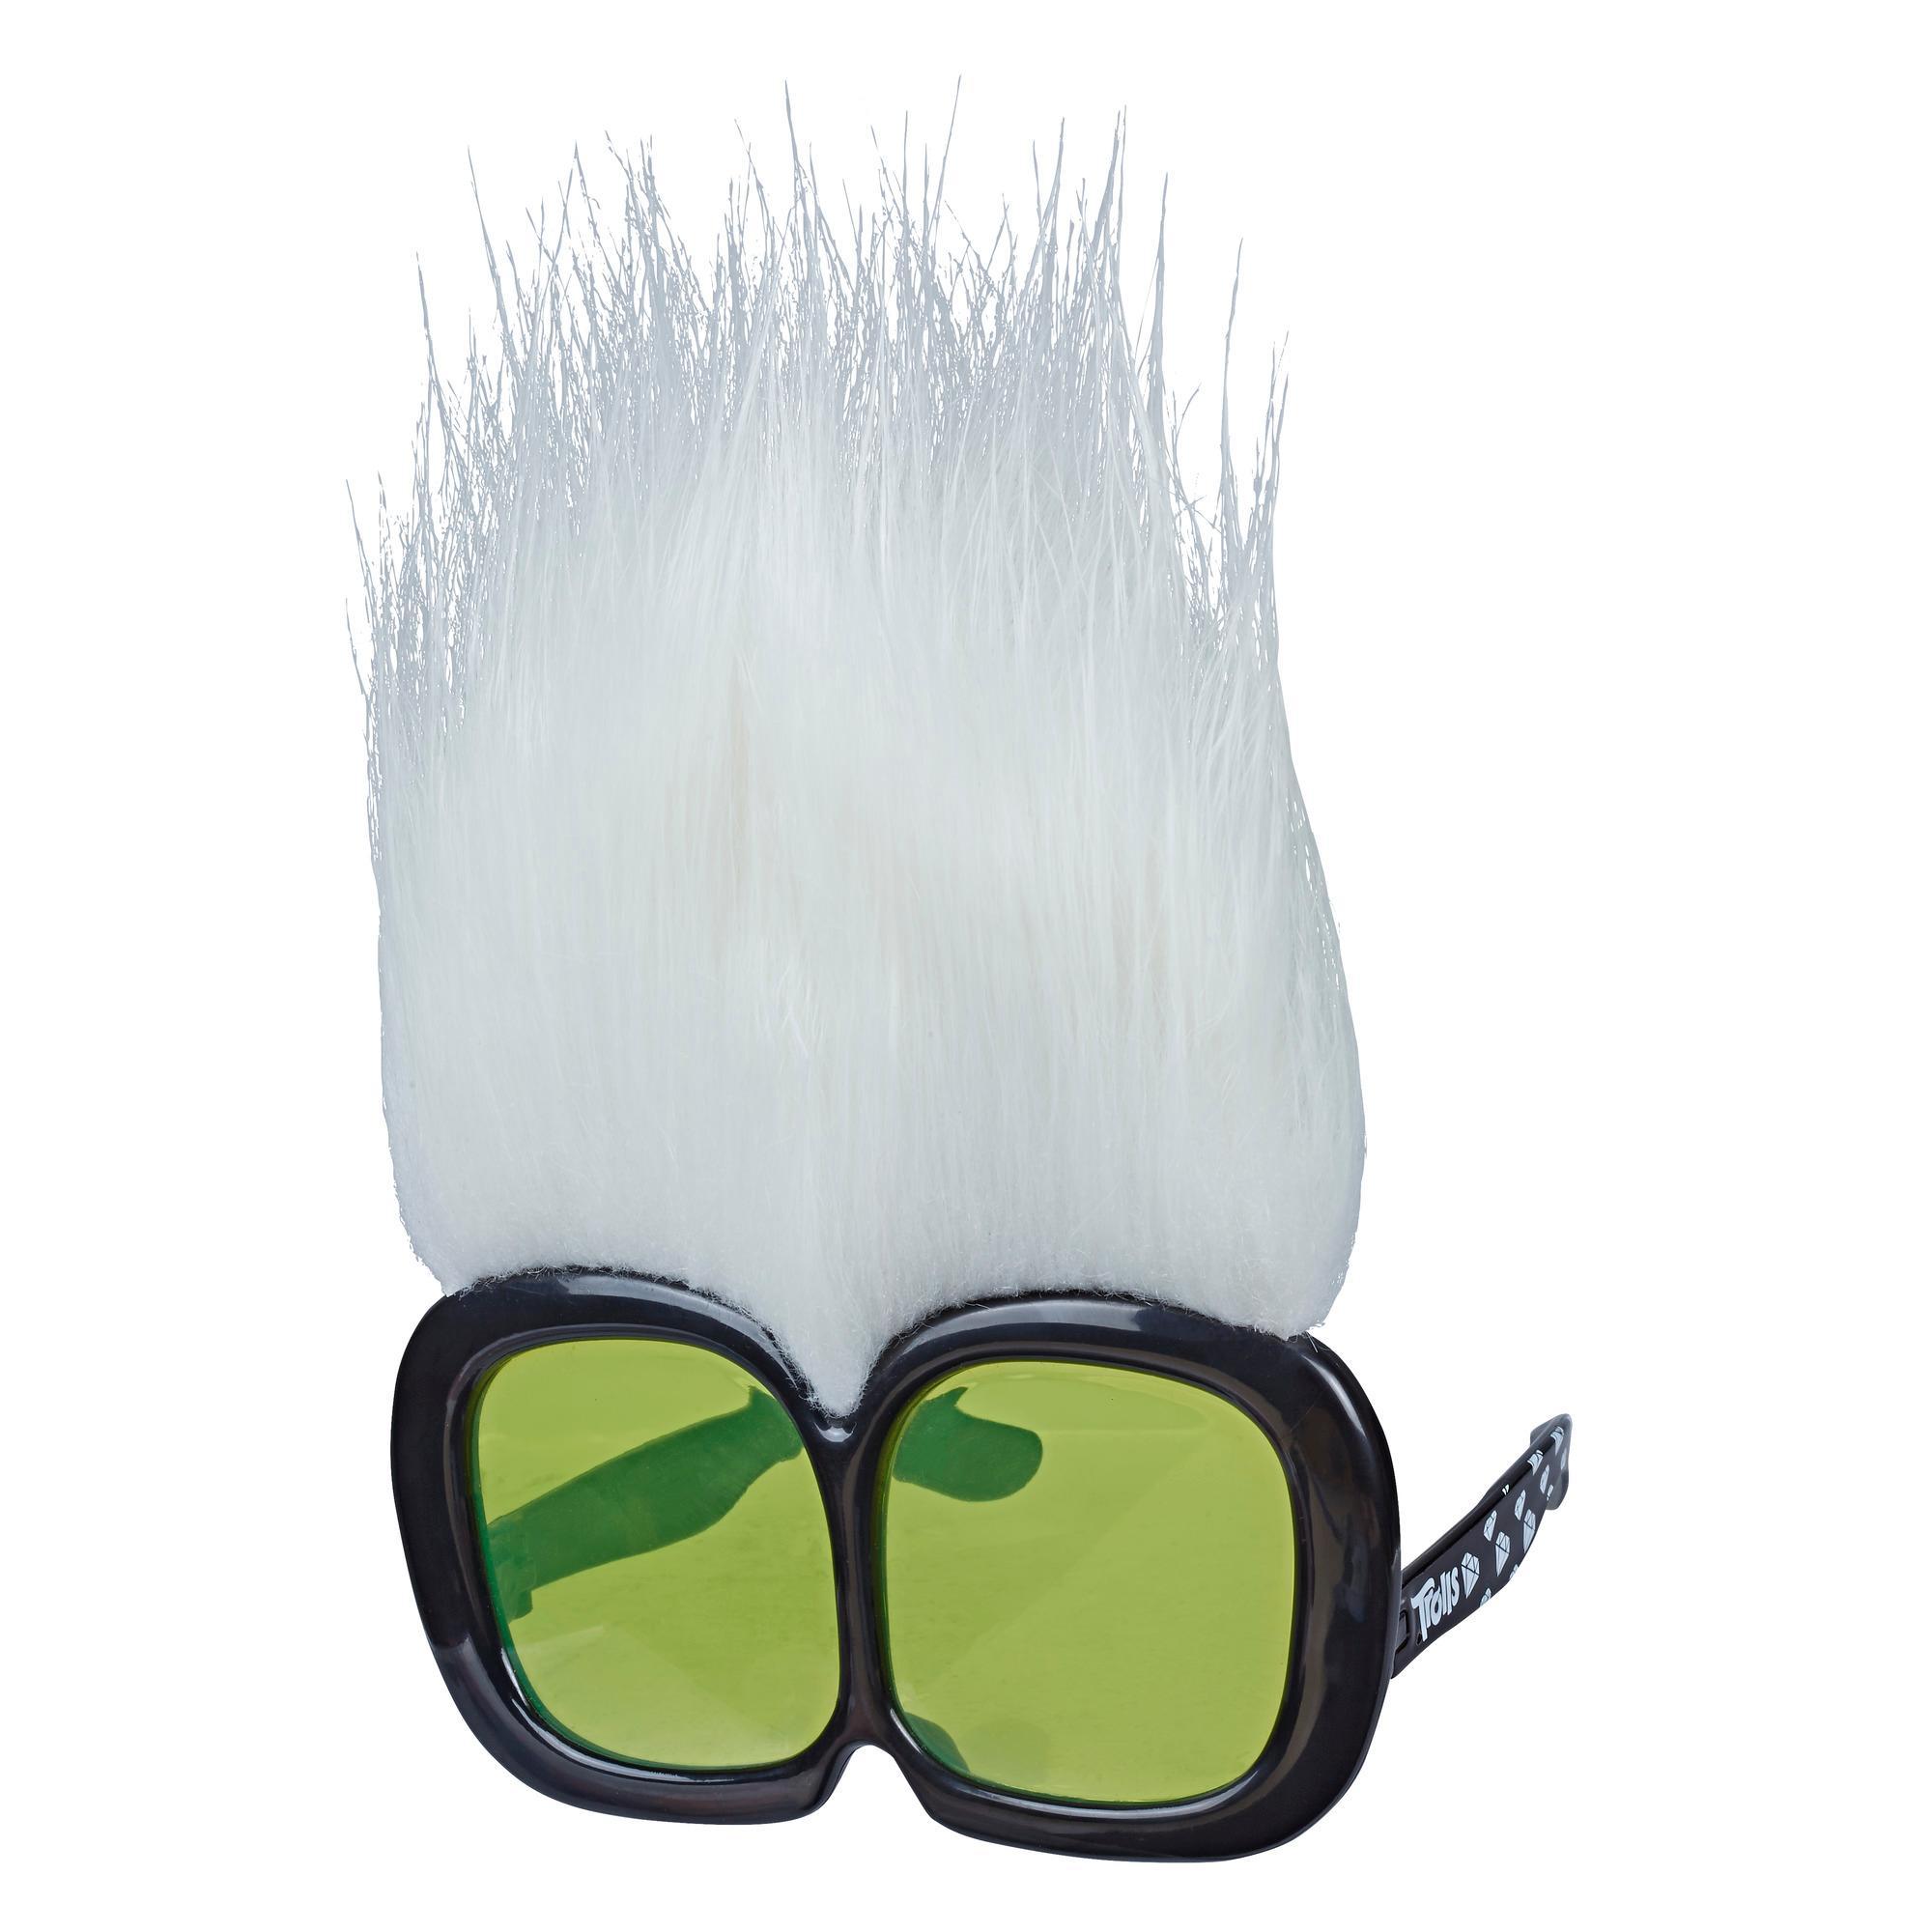 DreamWorks Trolls - Look per la discoteca di Tiny Diamond - Occhiali da sole divertenti ispirati al film Trolls World Tour